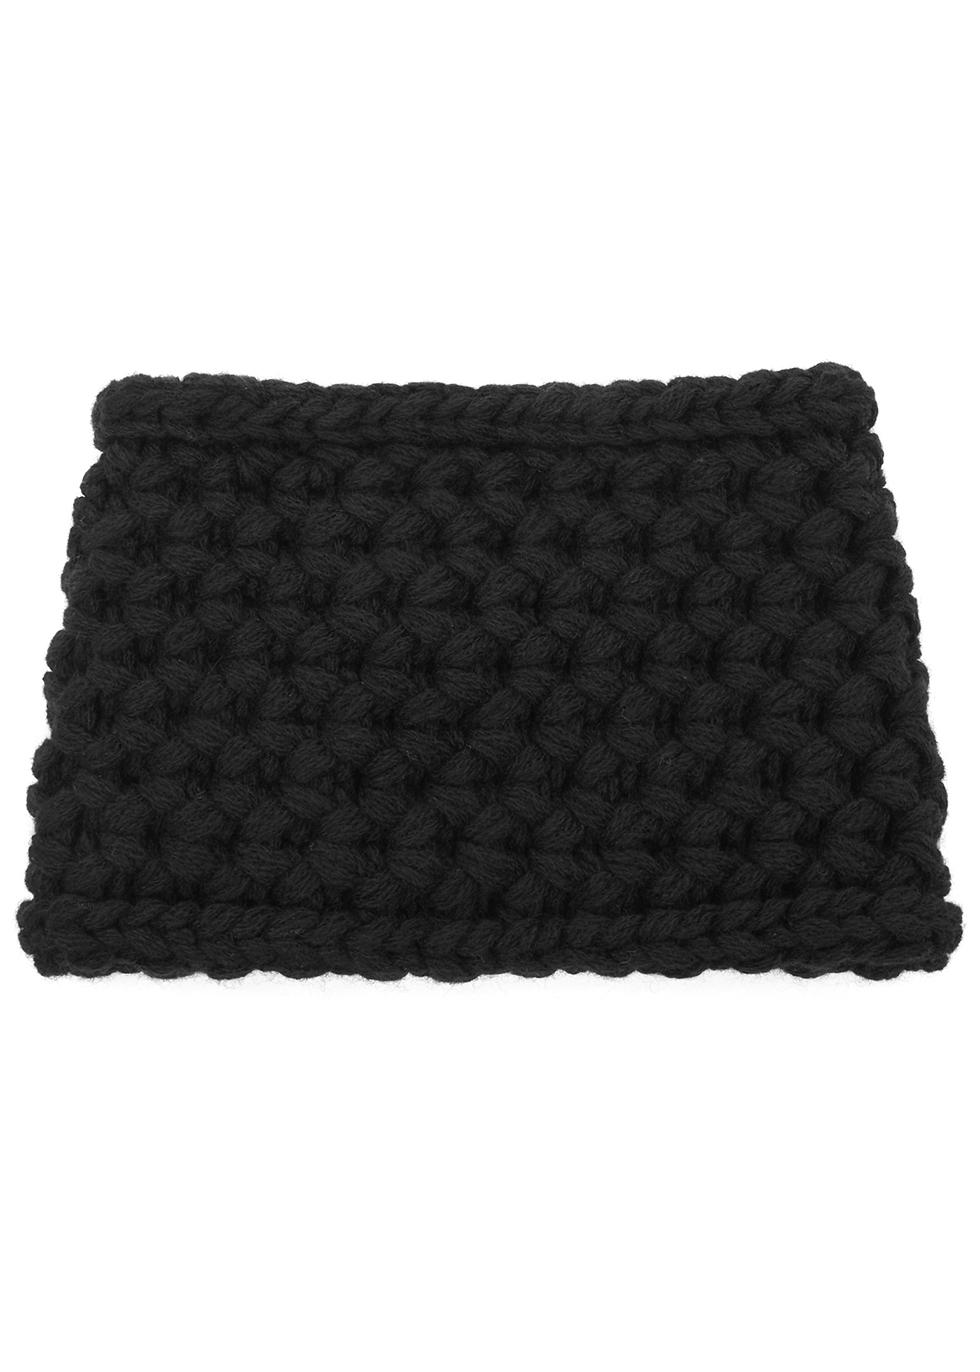 Diva black chunky-knit cashmere headband